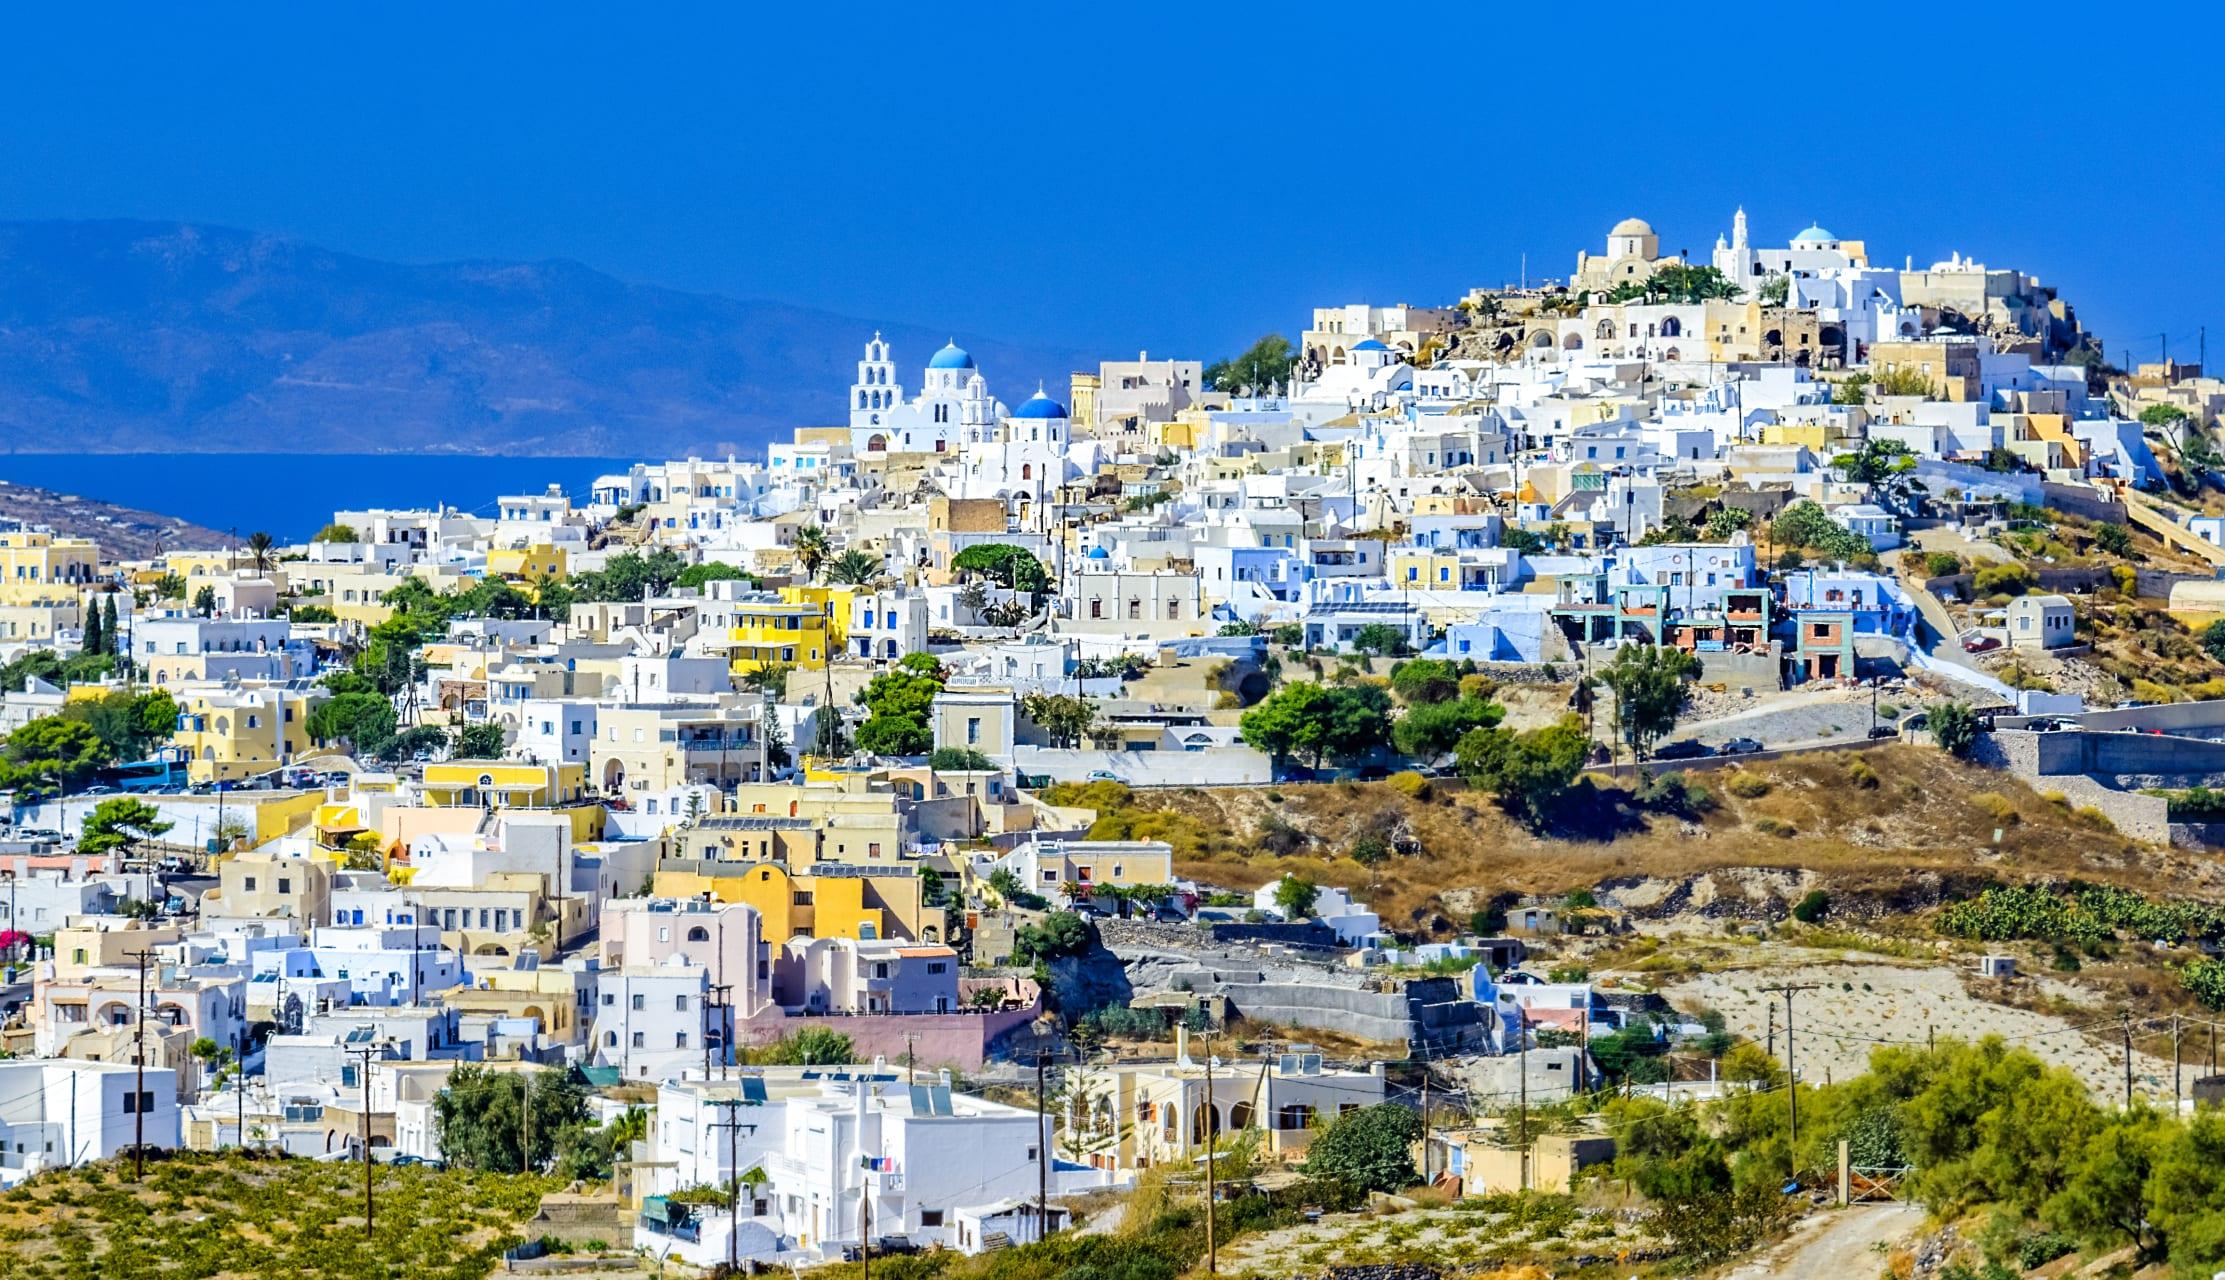 Santorini - Pyrgos: A Medieval Castle City in the Heart of Santorini